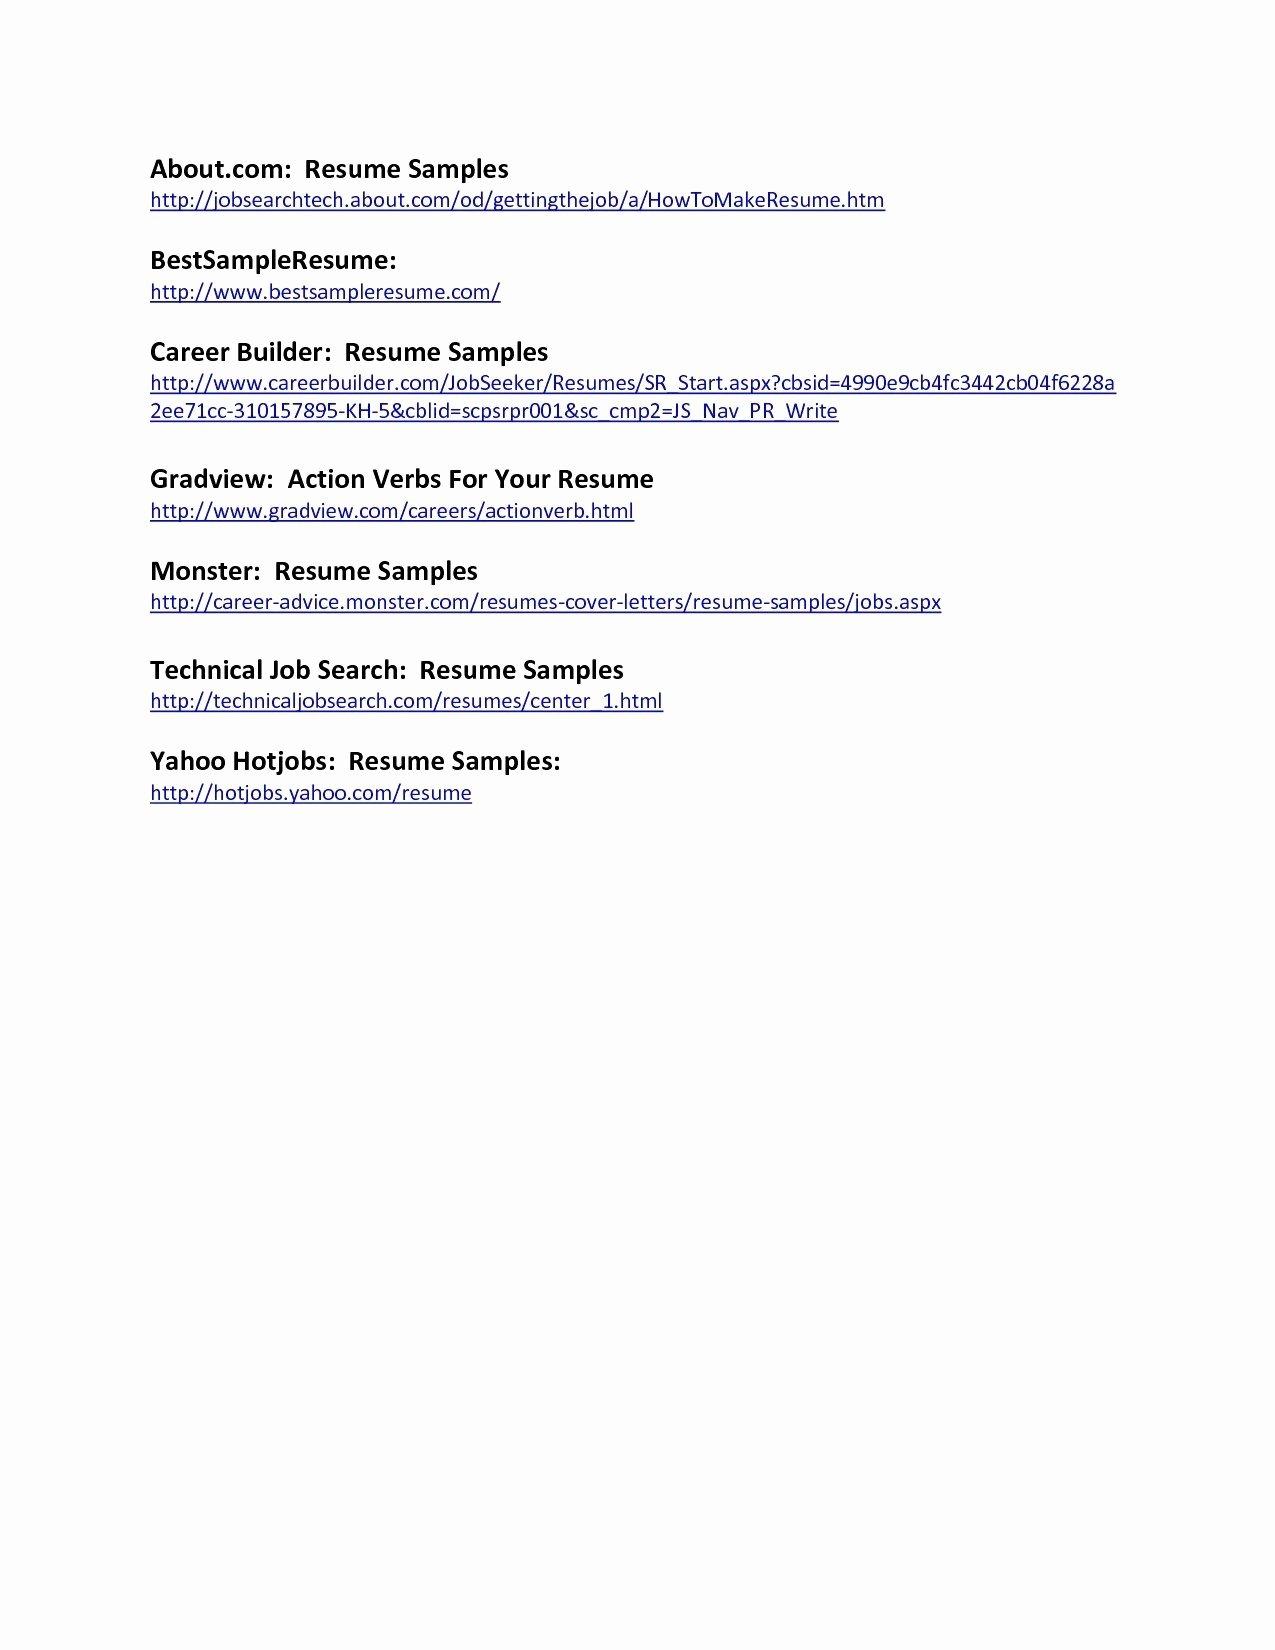 Voluntary Demotion Letter Sample Lovely Valid Free Demotion Letter Template